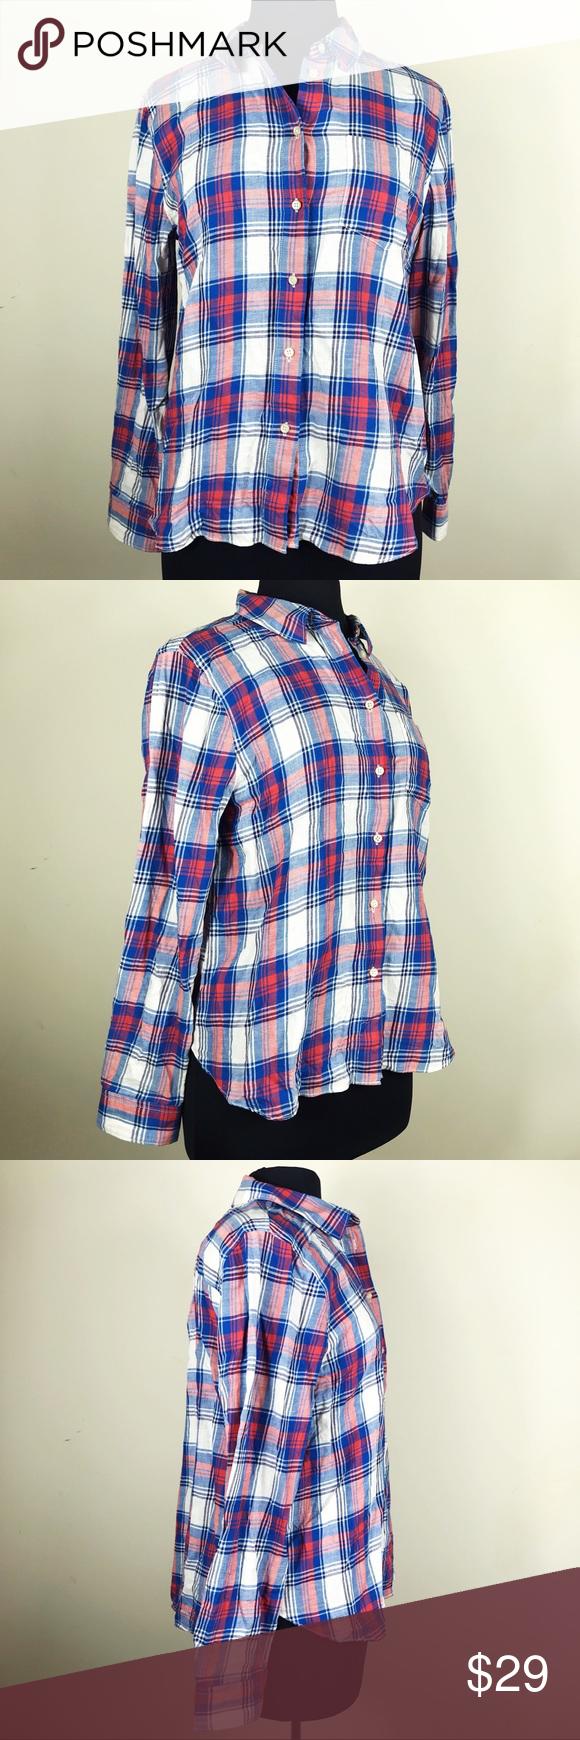 d3359fe9bd4 Madewell Shirt Madewell Shirt Madewell Tops Button Down Shirts